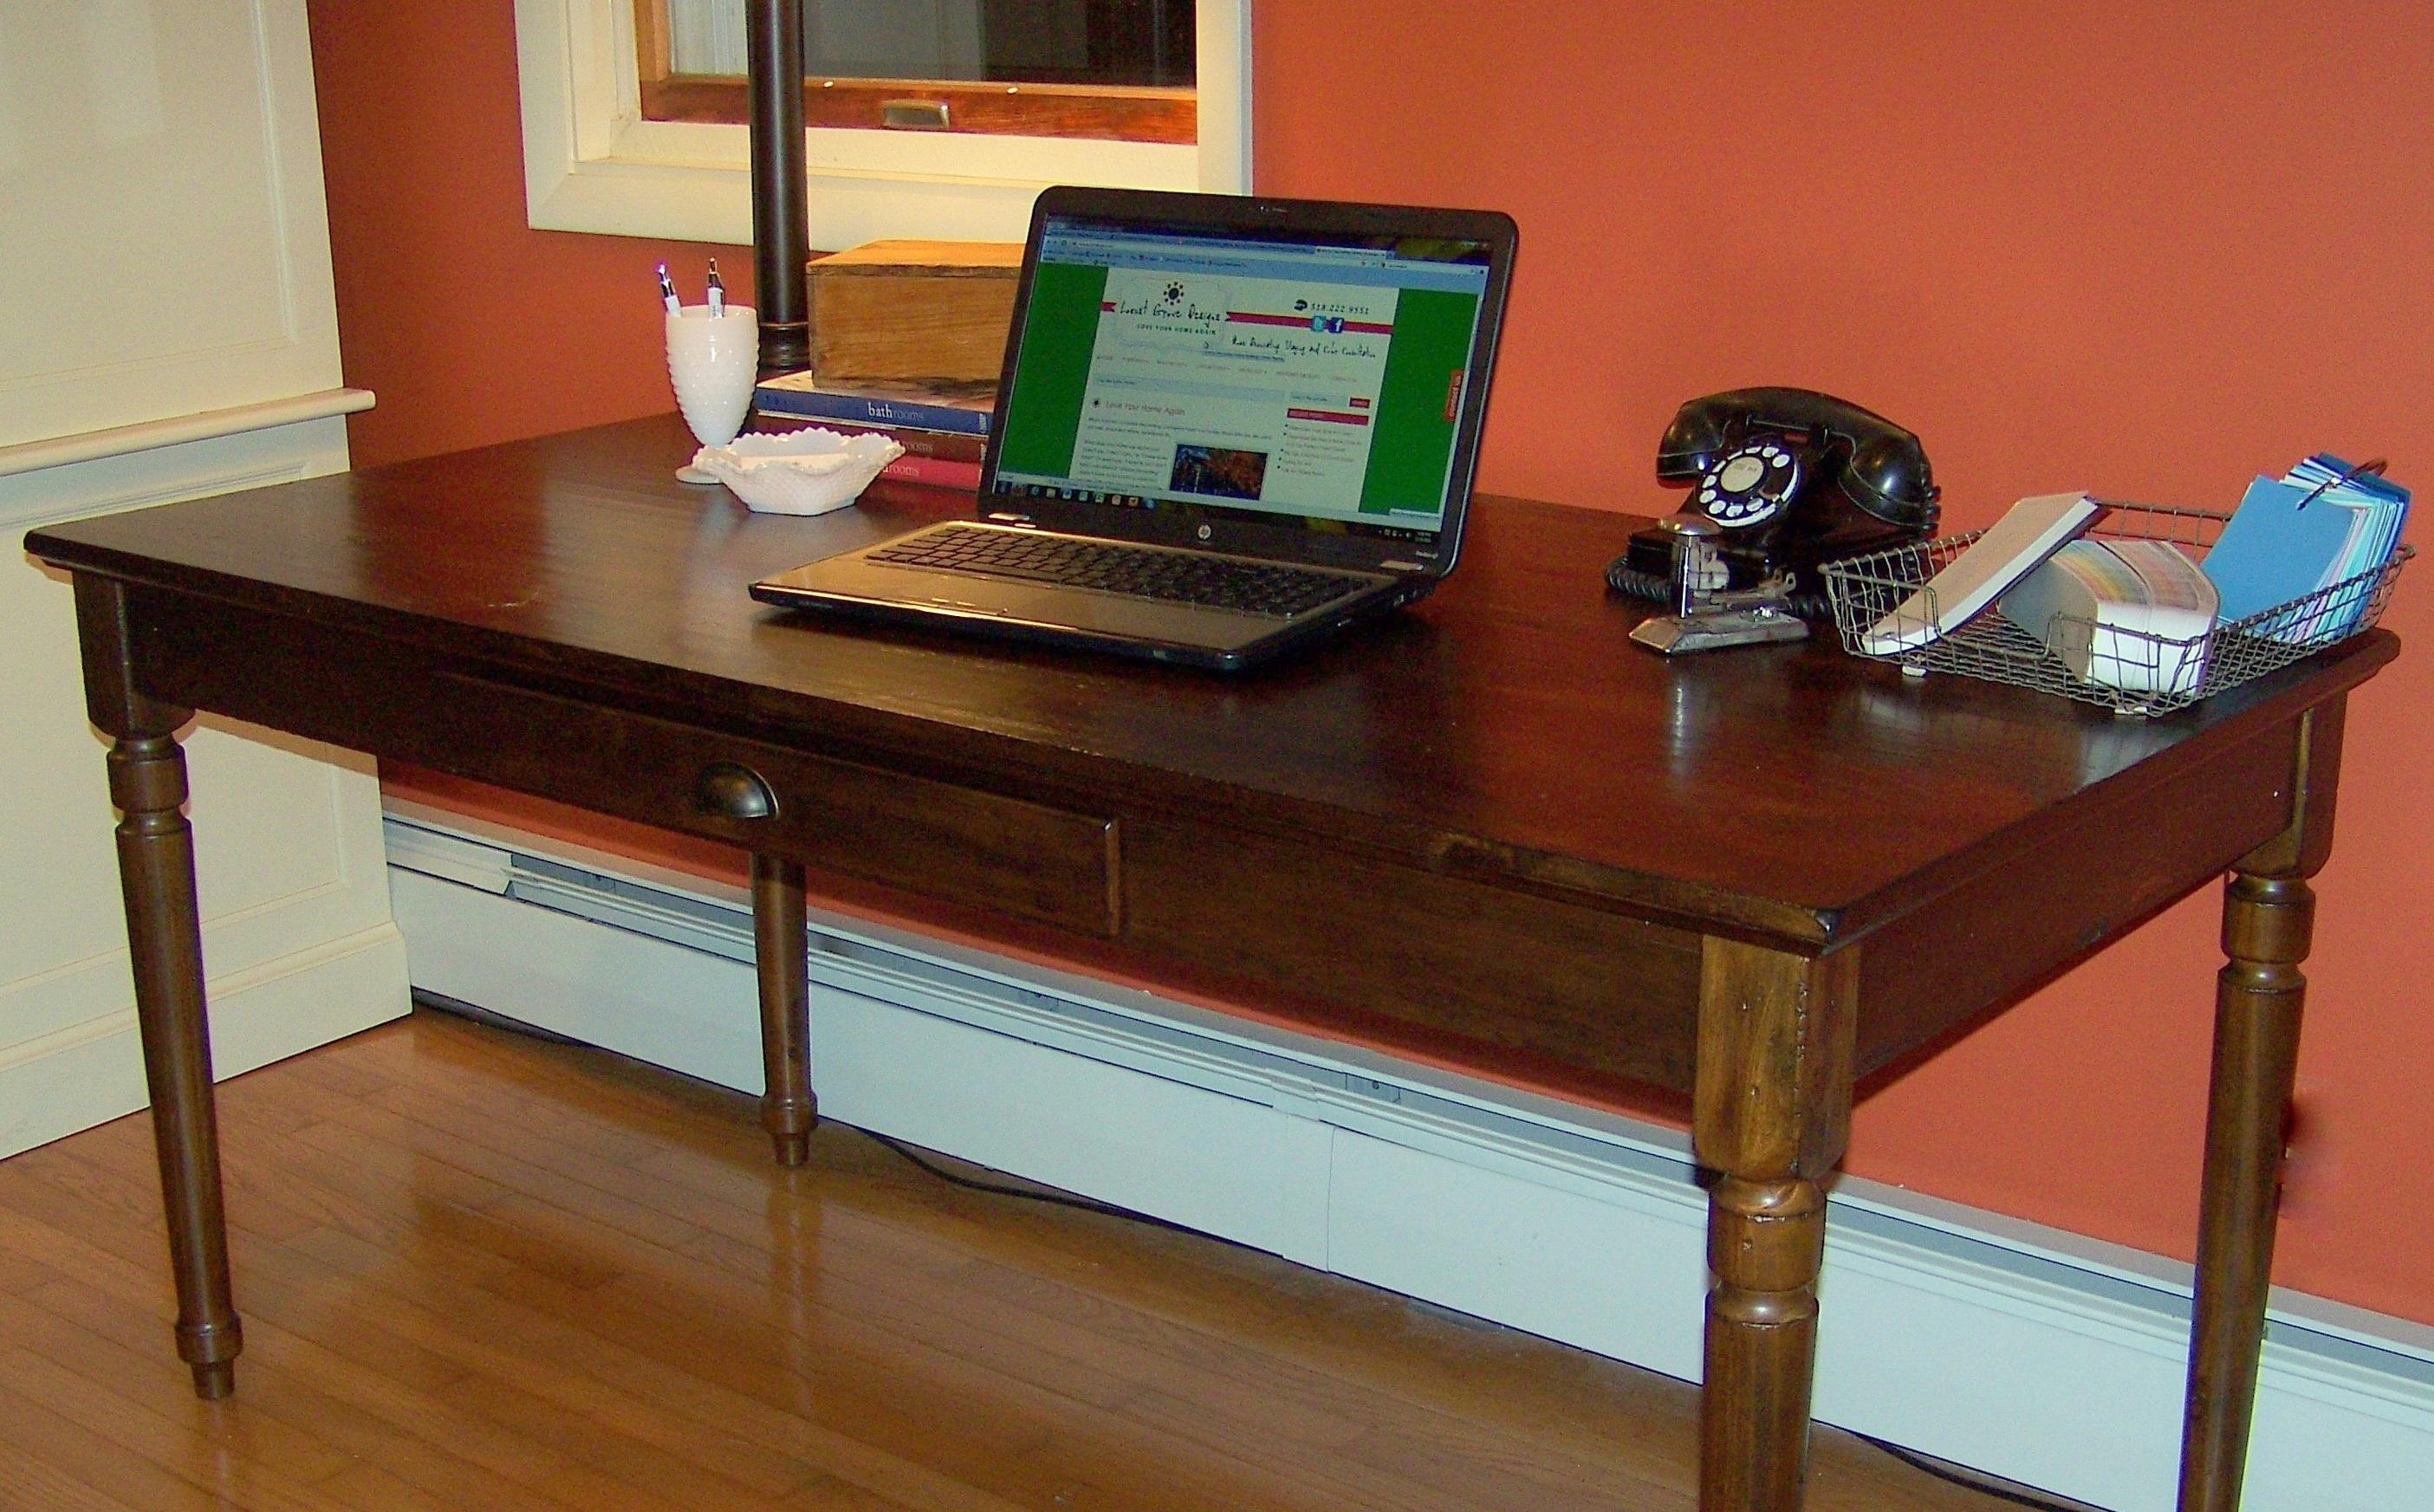 airgo swivel desk chair alice in wonderland pottery barn hostgarcia